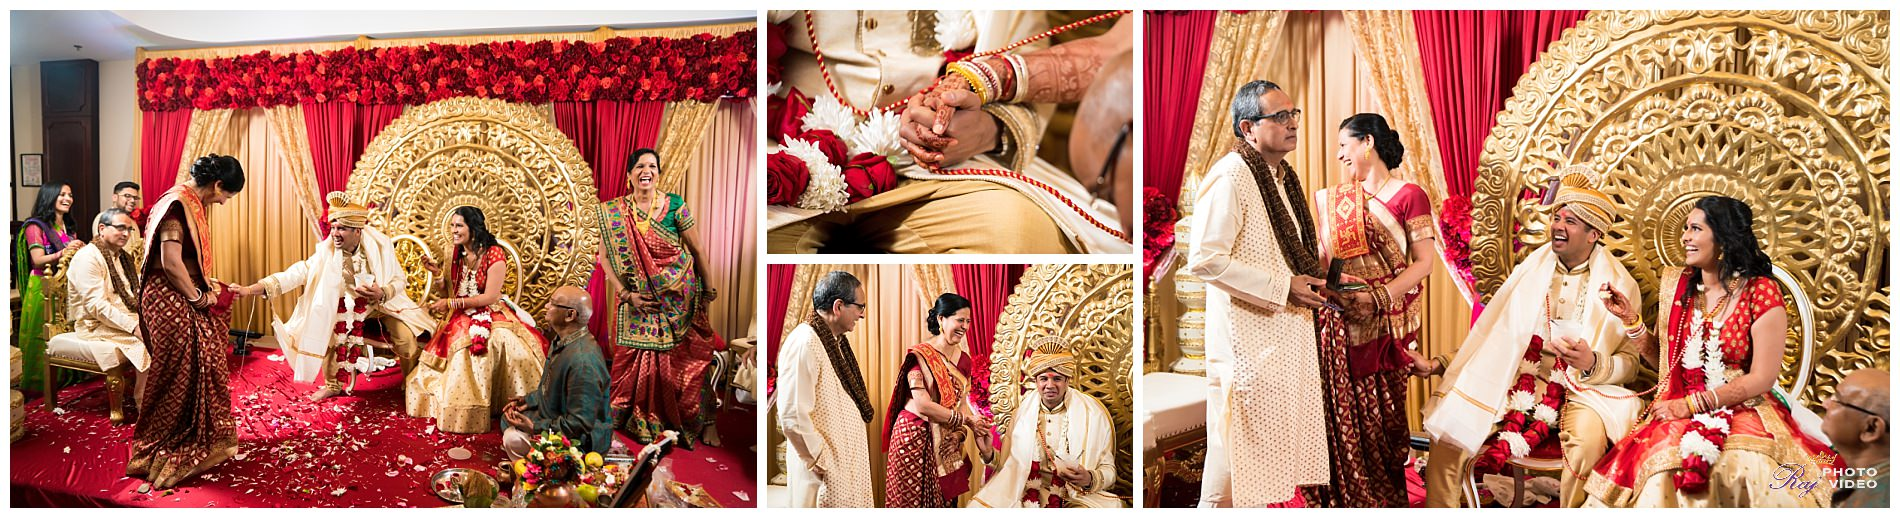 Martinsville-Gardens-NJ-Indian-Wedding-Ruchi-Vishal-32.jpg